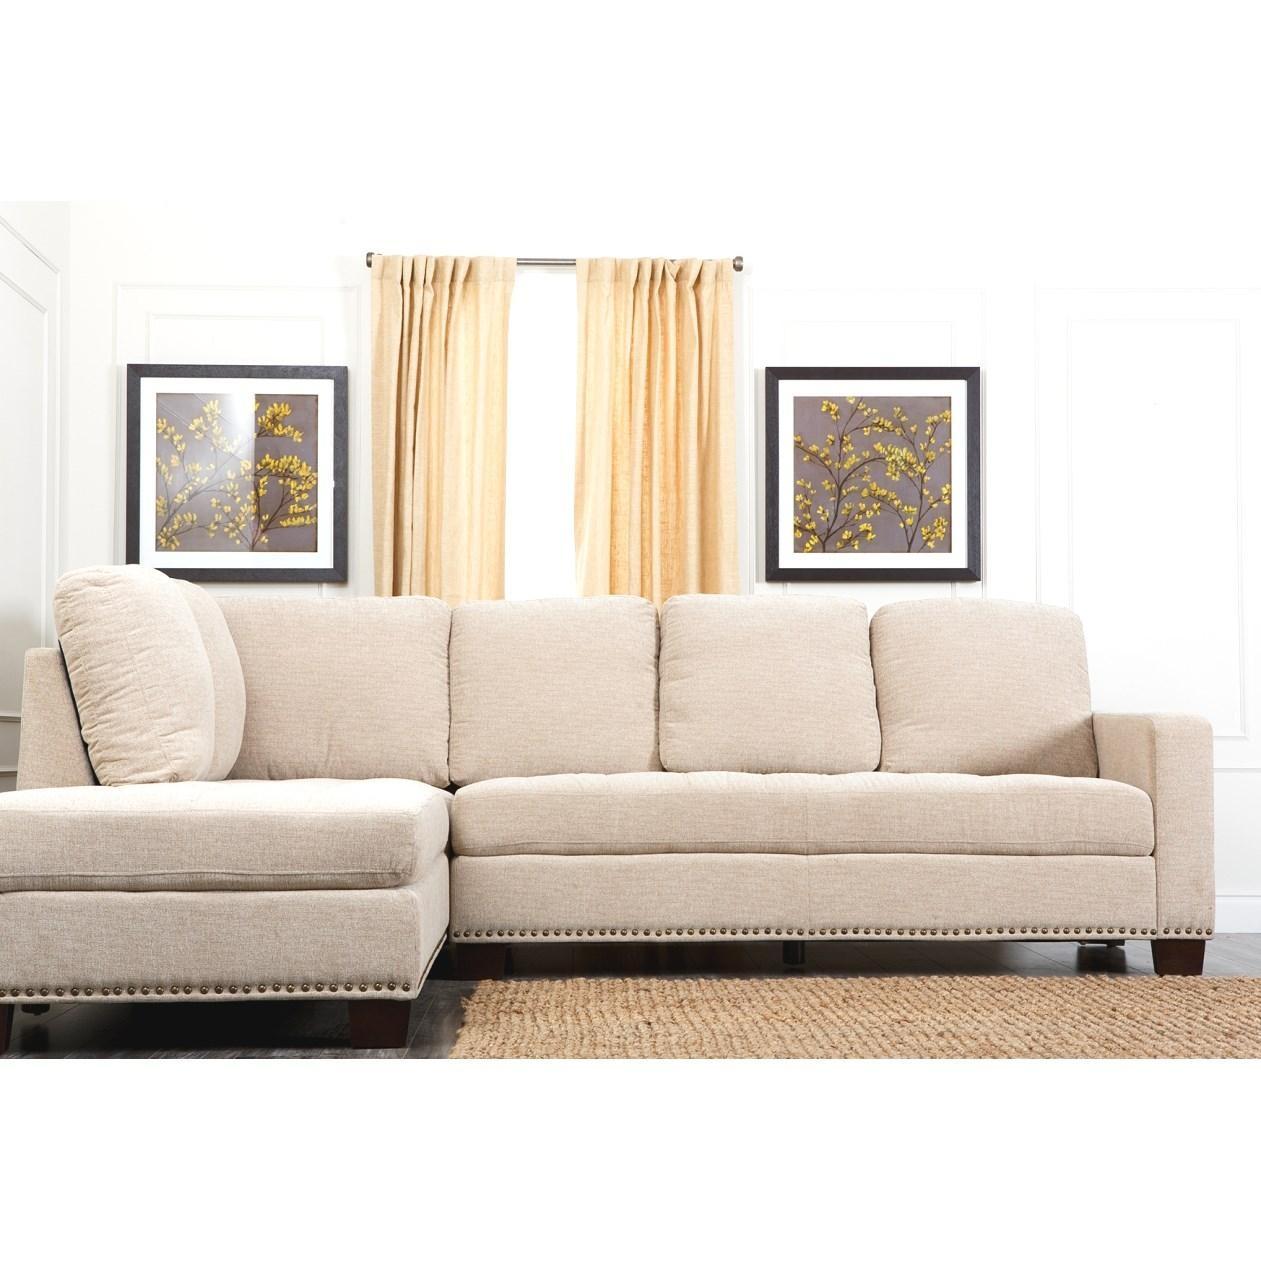 Abbyson Living Ci D10357 Crm Claridge Fabric Sectional In Cream Intended For Abbyson Living Sectionals (Image 5 of 15)